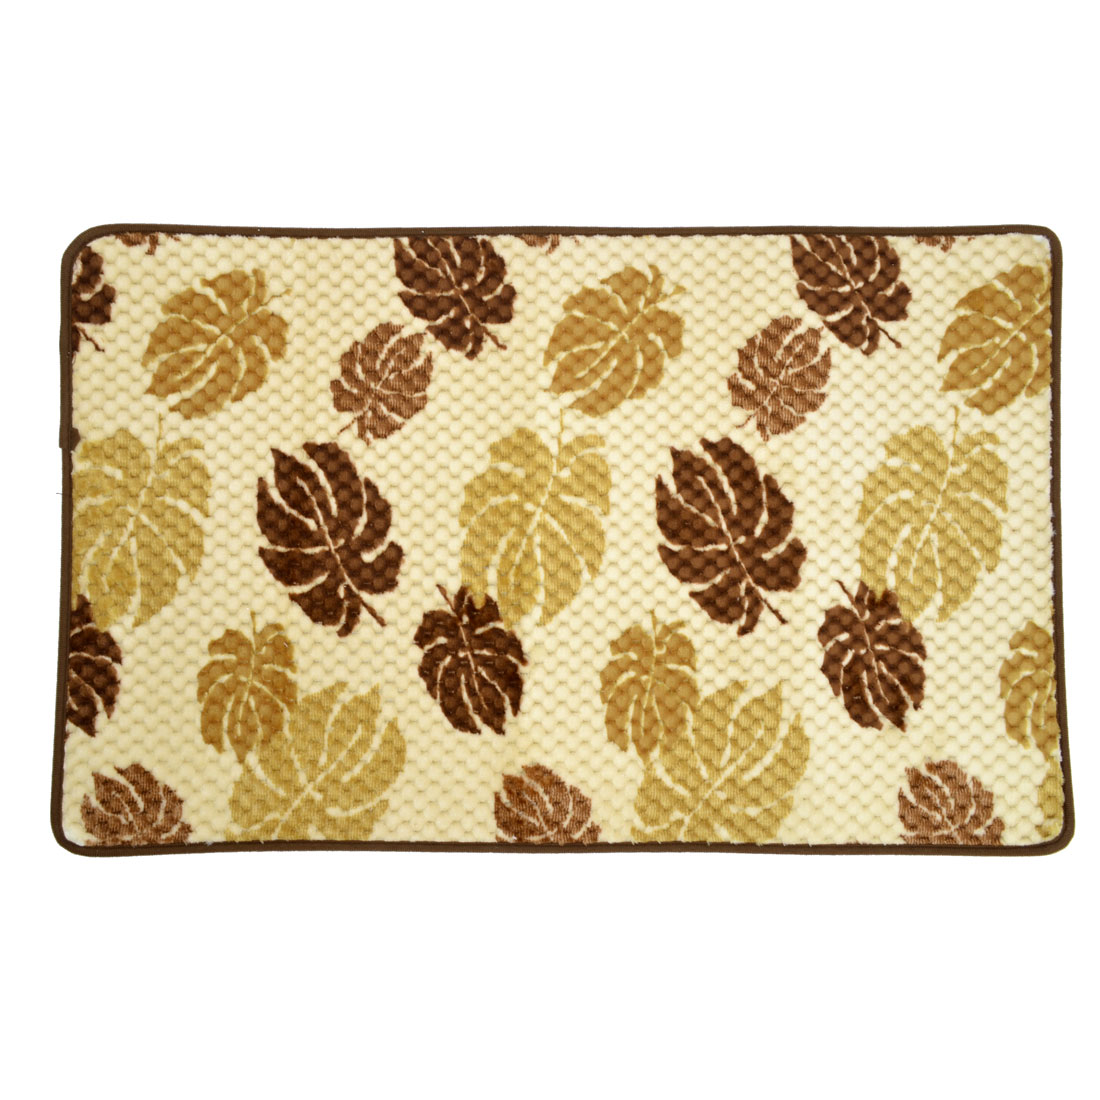 Brown Beige Coral Fleece Leaf Pattern Kitchen Floor Area Rug Carpet 80cm x 50cm